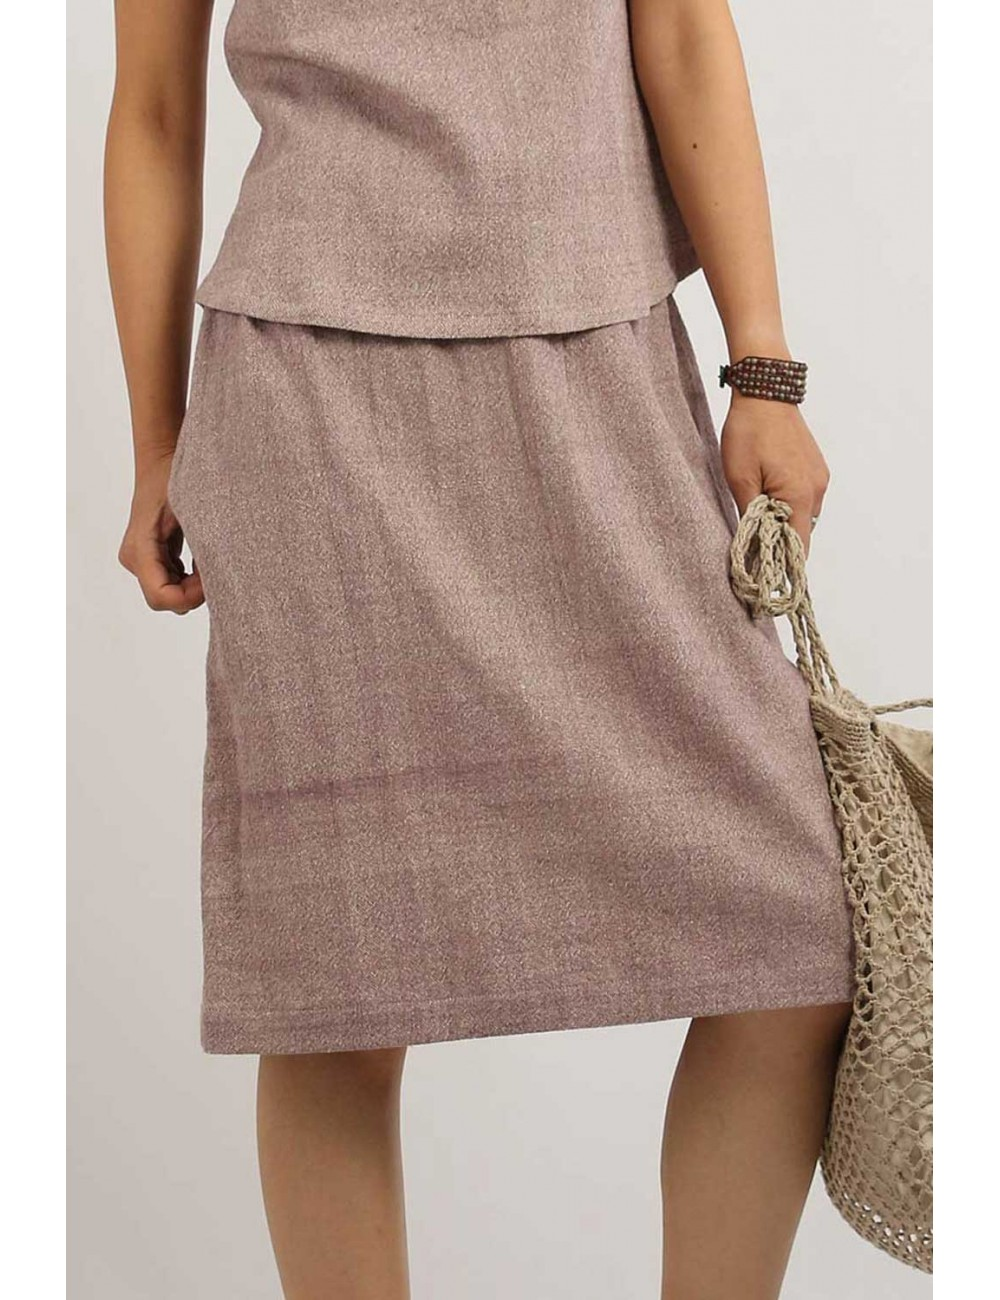 Anna Cotton Hemp Skirt,...